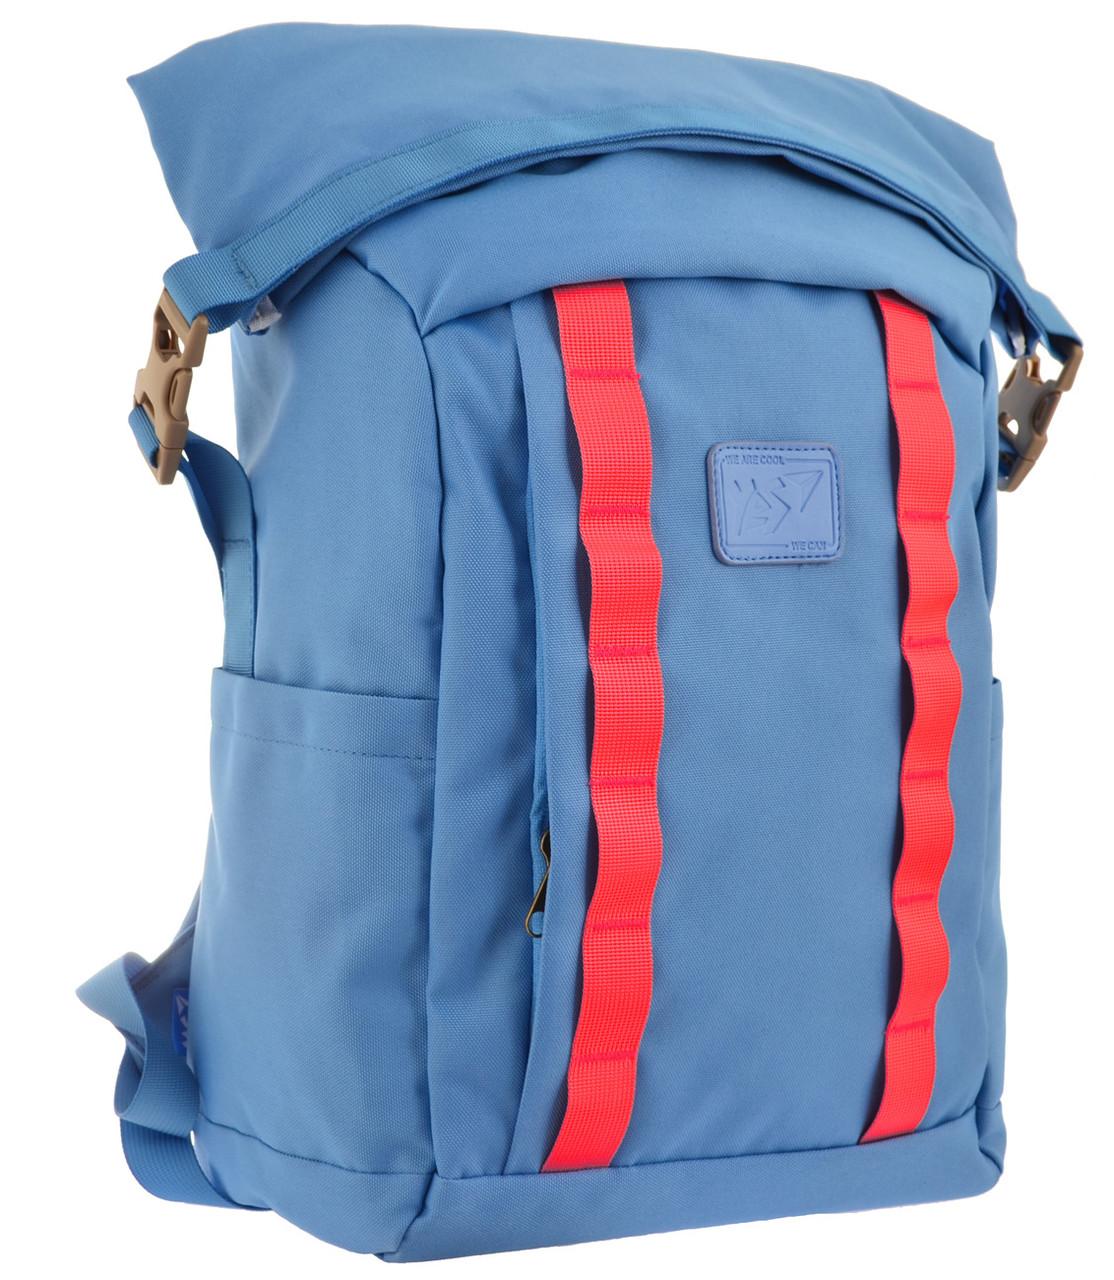 Рюкзак міський YES Roll-top T-61 18 л Blue Moon (557360)